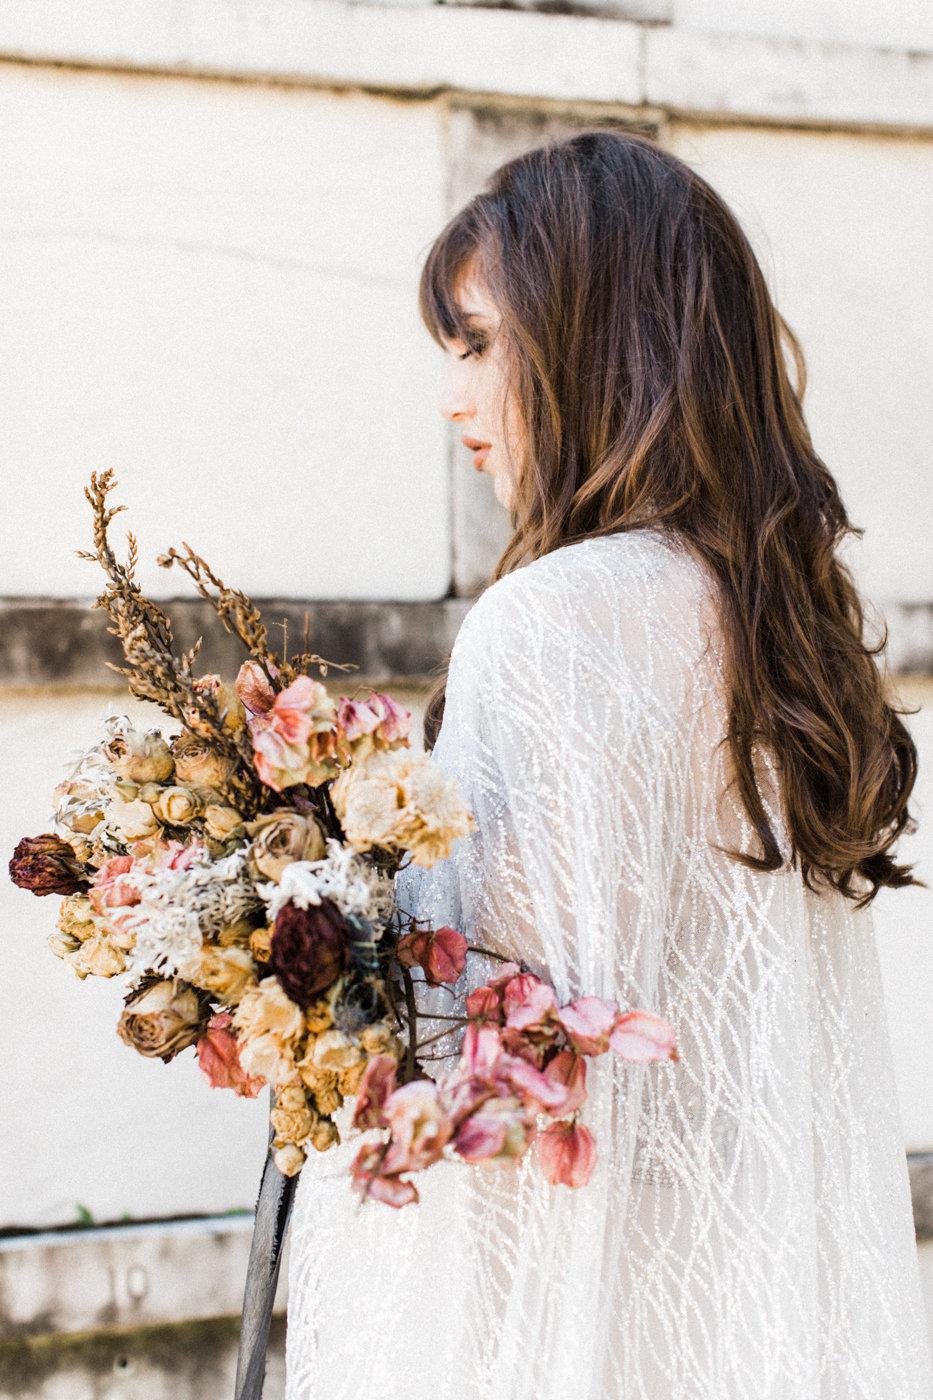 New Orleans florist